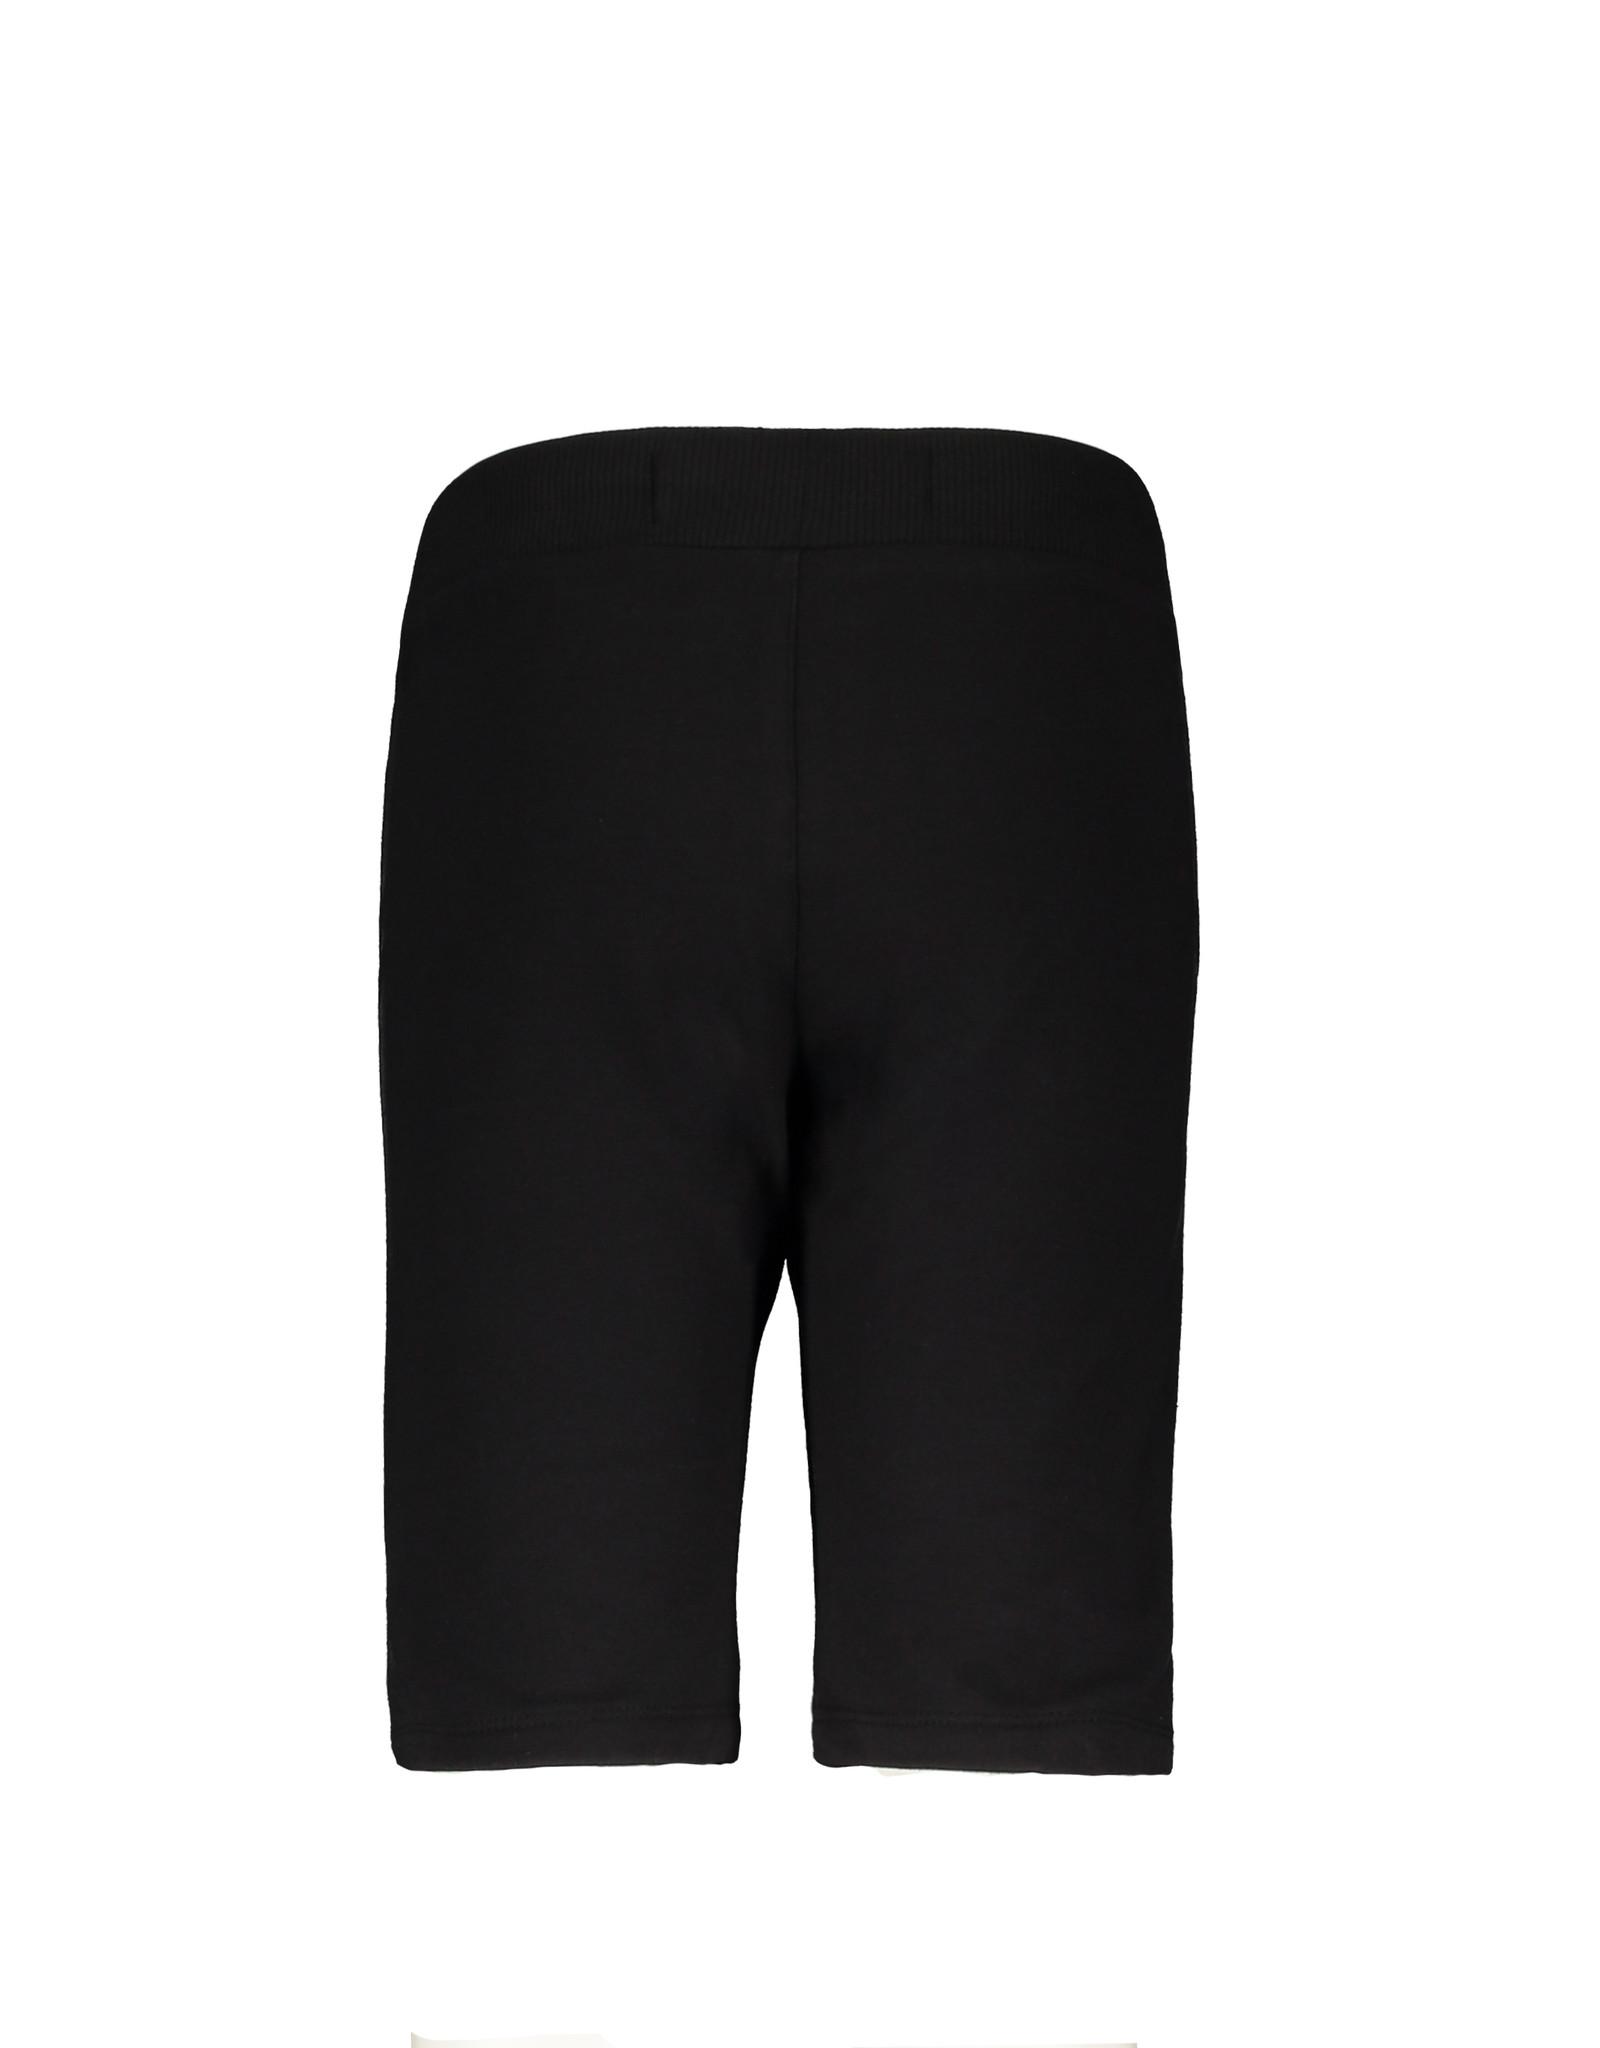 Moodstreet MT jog short, Black